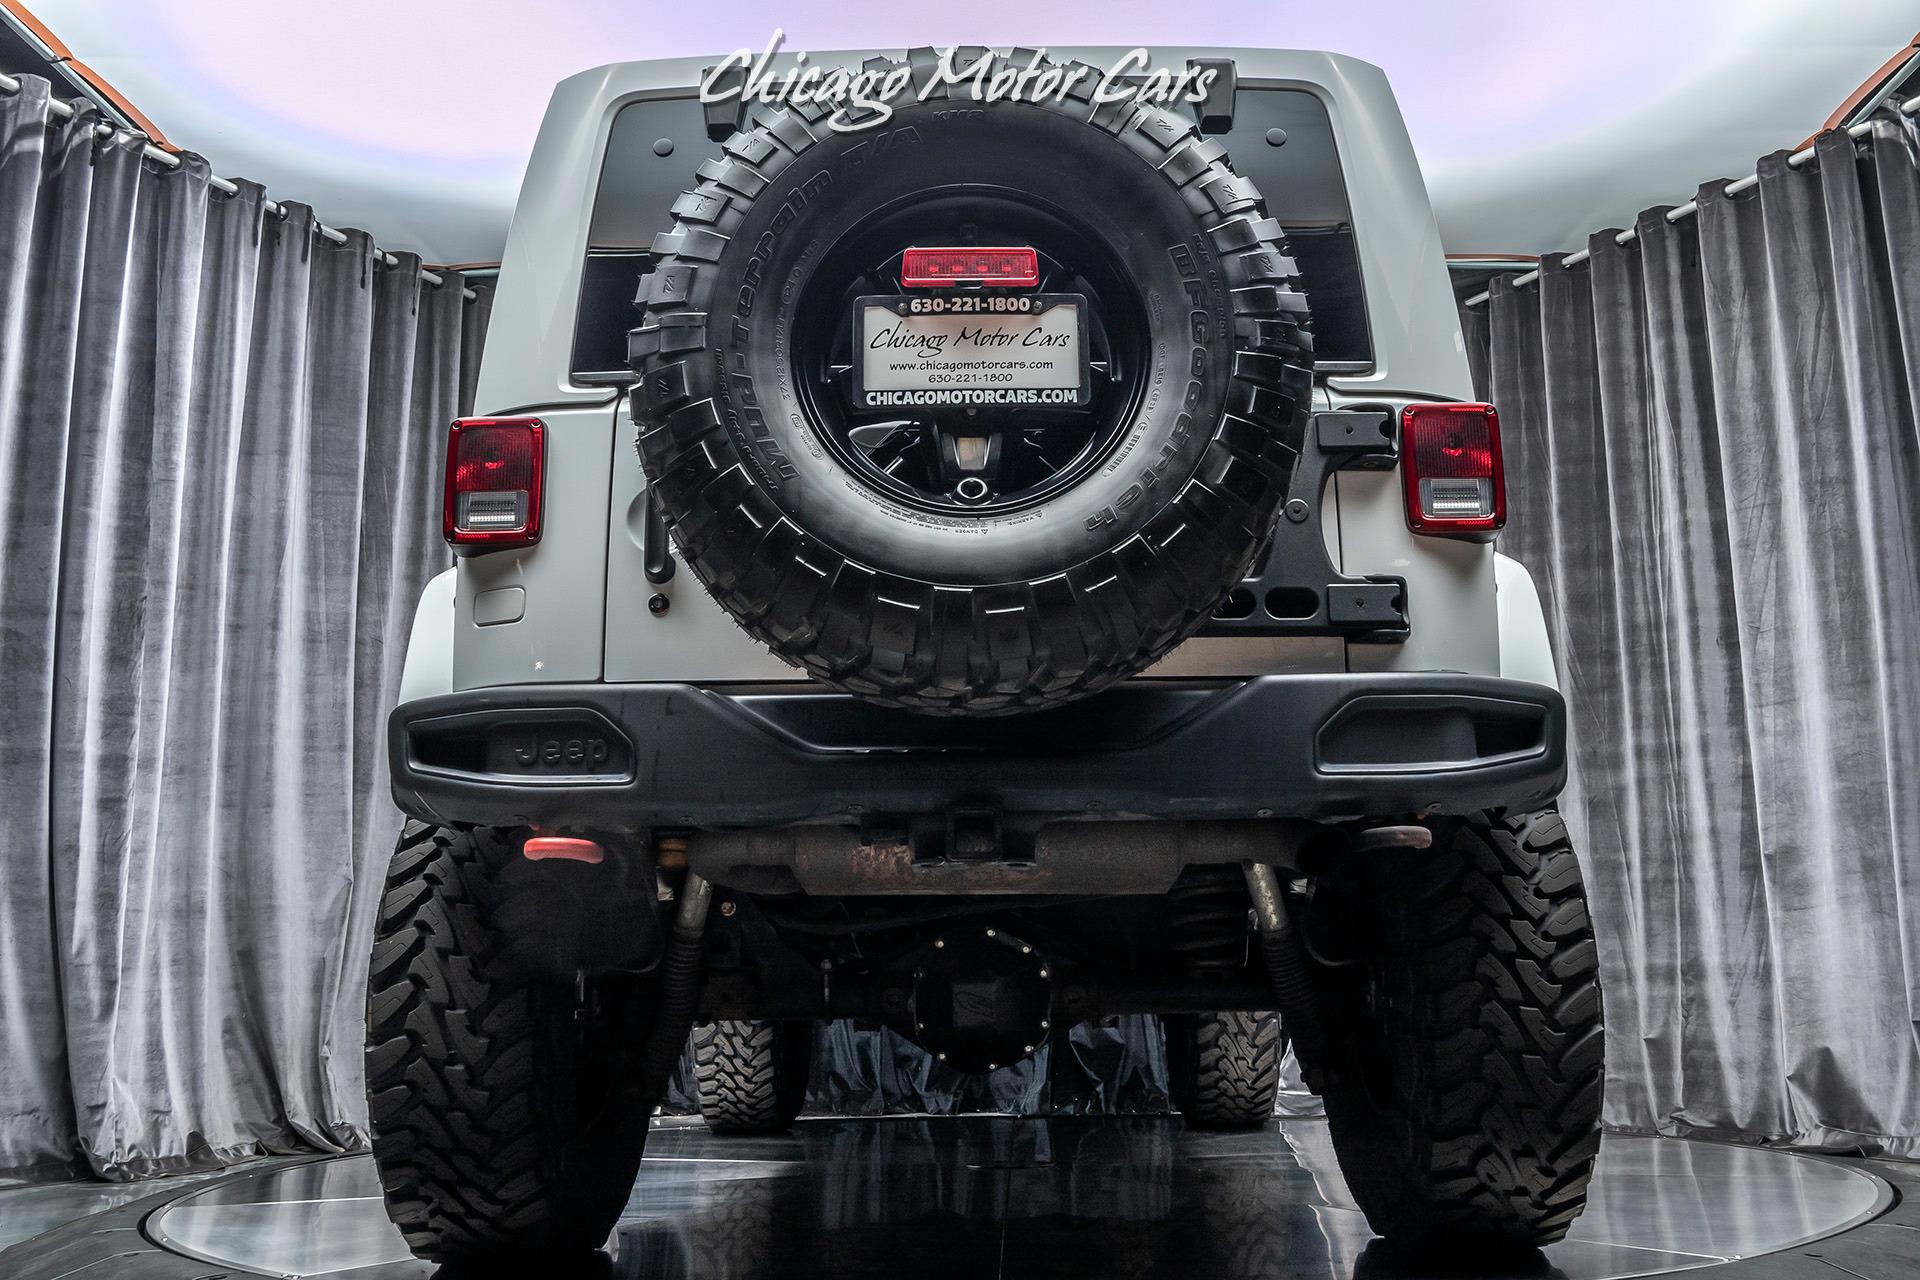 Used-2015-Jeep-Wrangler-Unlimited-Rubicon-64L-SRT-HEMI